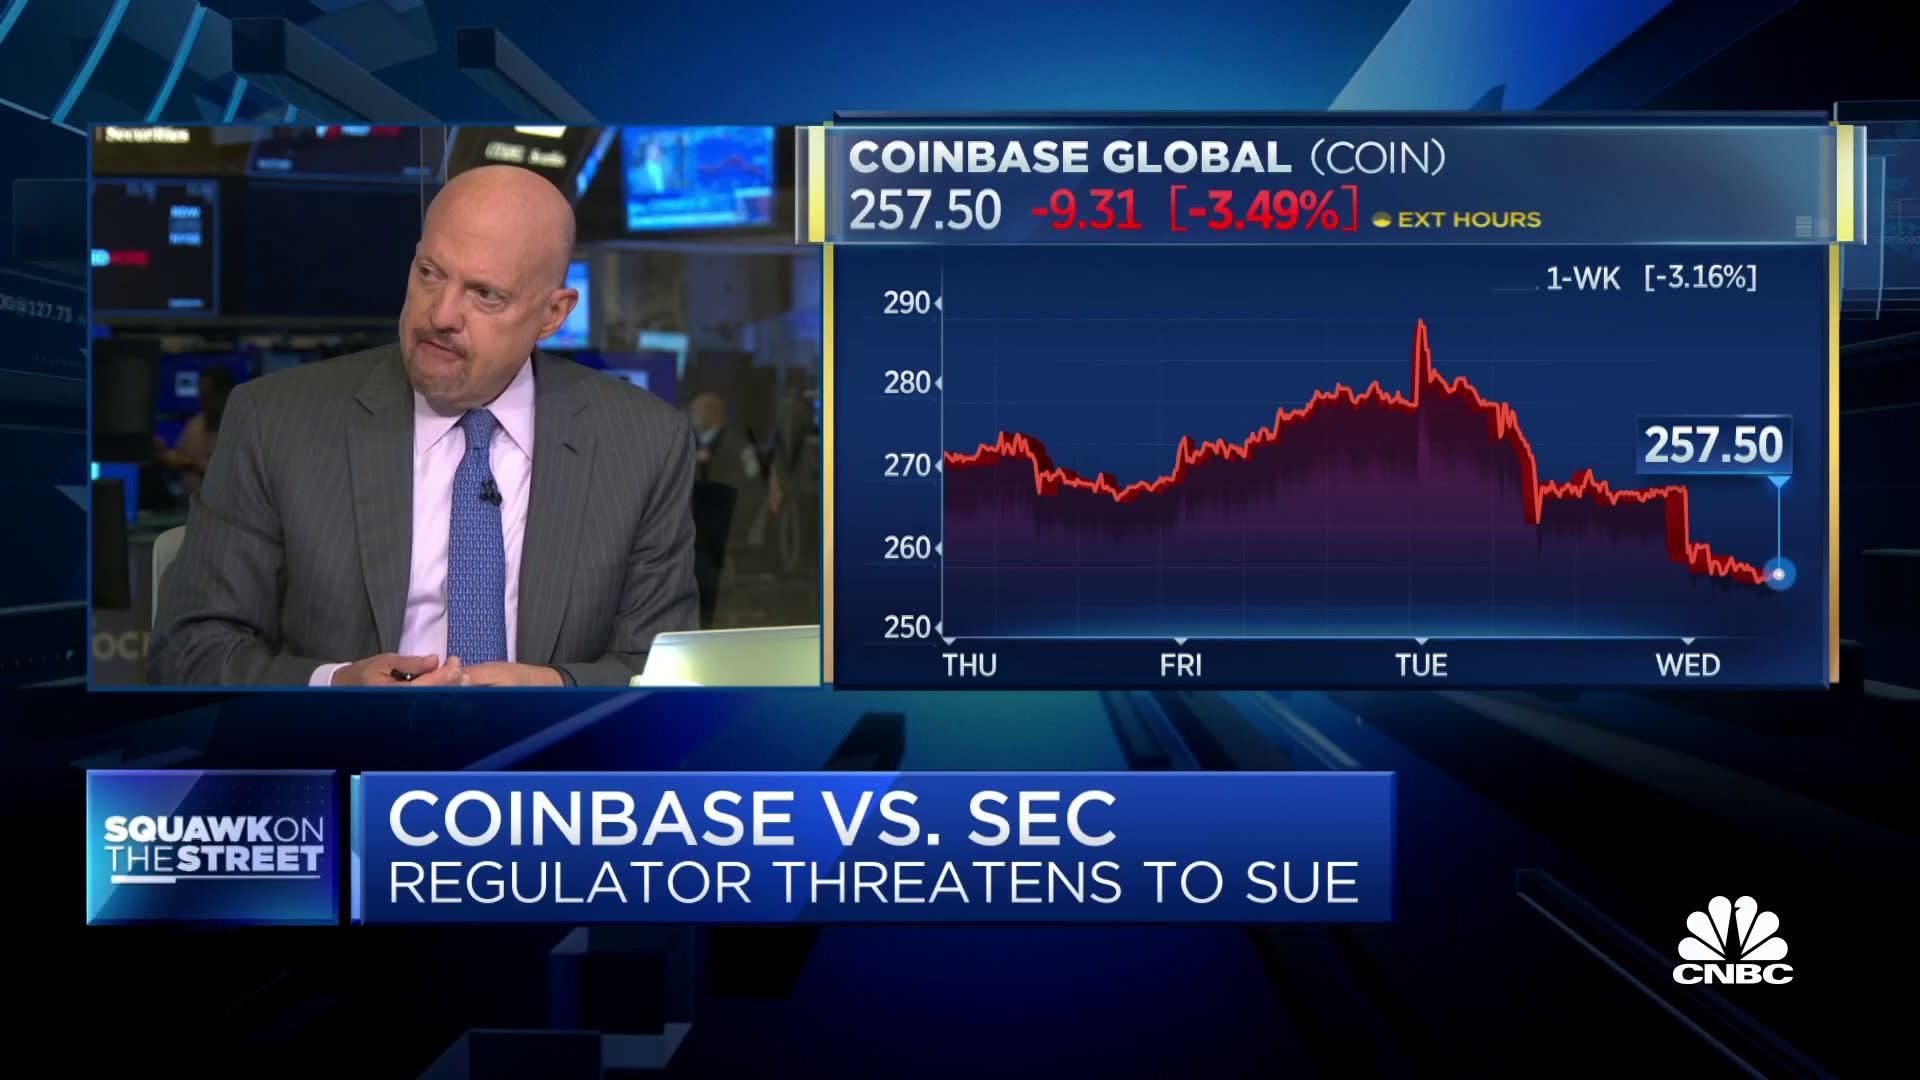 SEC Vs Coinbase